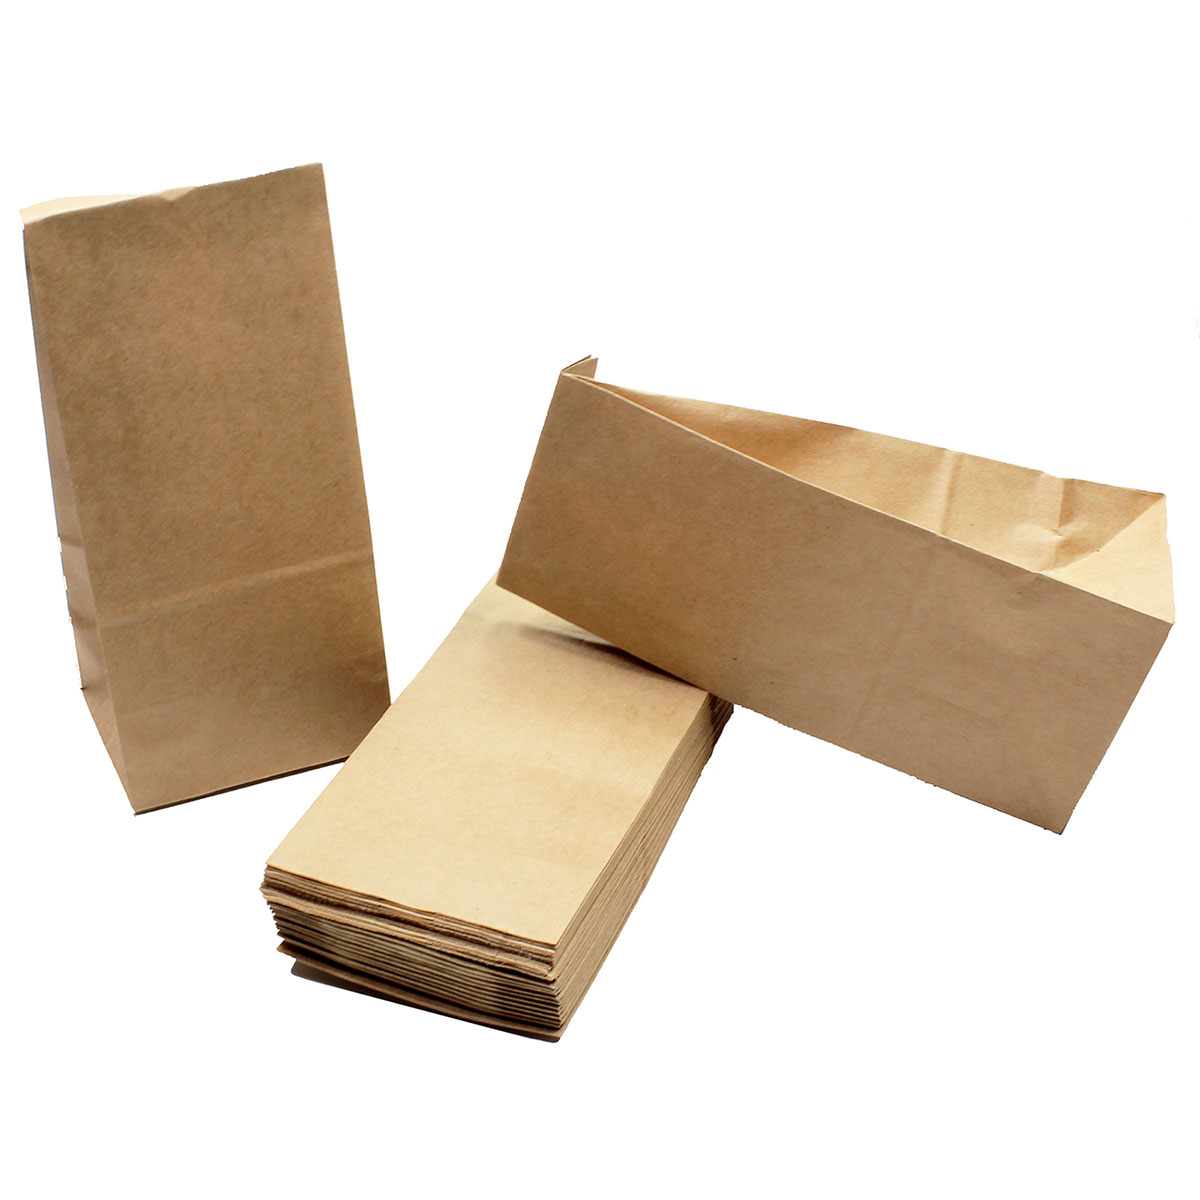 50 papiert ten braun in gr e 19x8x6 5 cm aus kraftpapier ideal zum bef llen f r. Black Bedroom Furniture Sets. Home Design Ideas